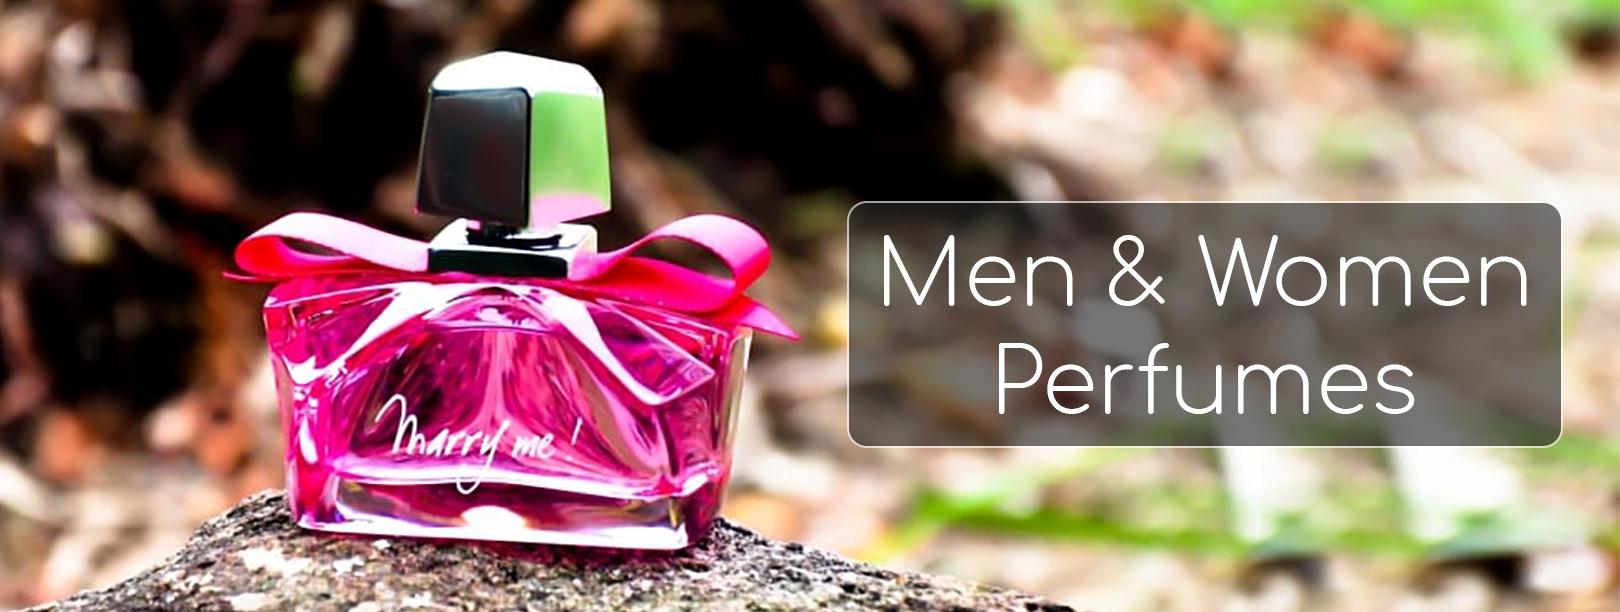 Myntra Men & Women Perfumes